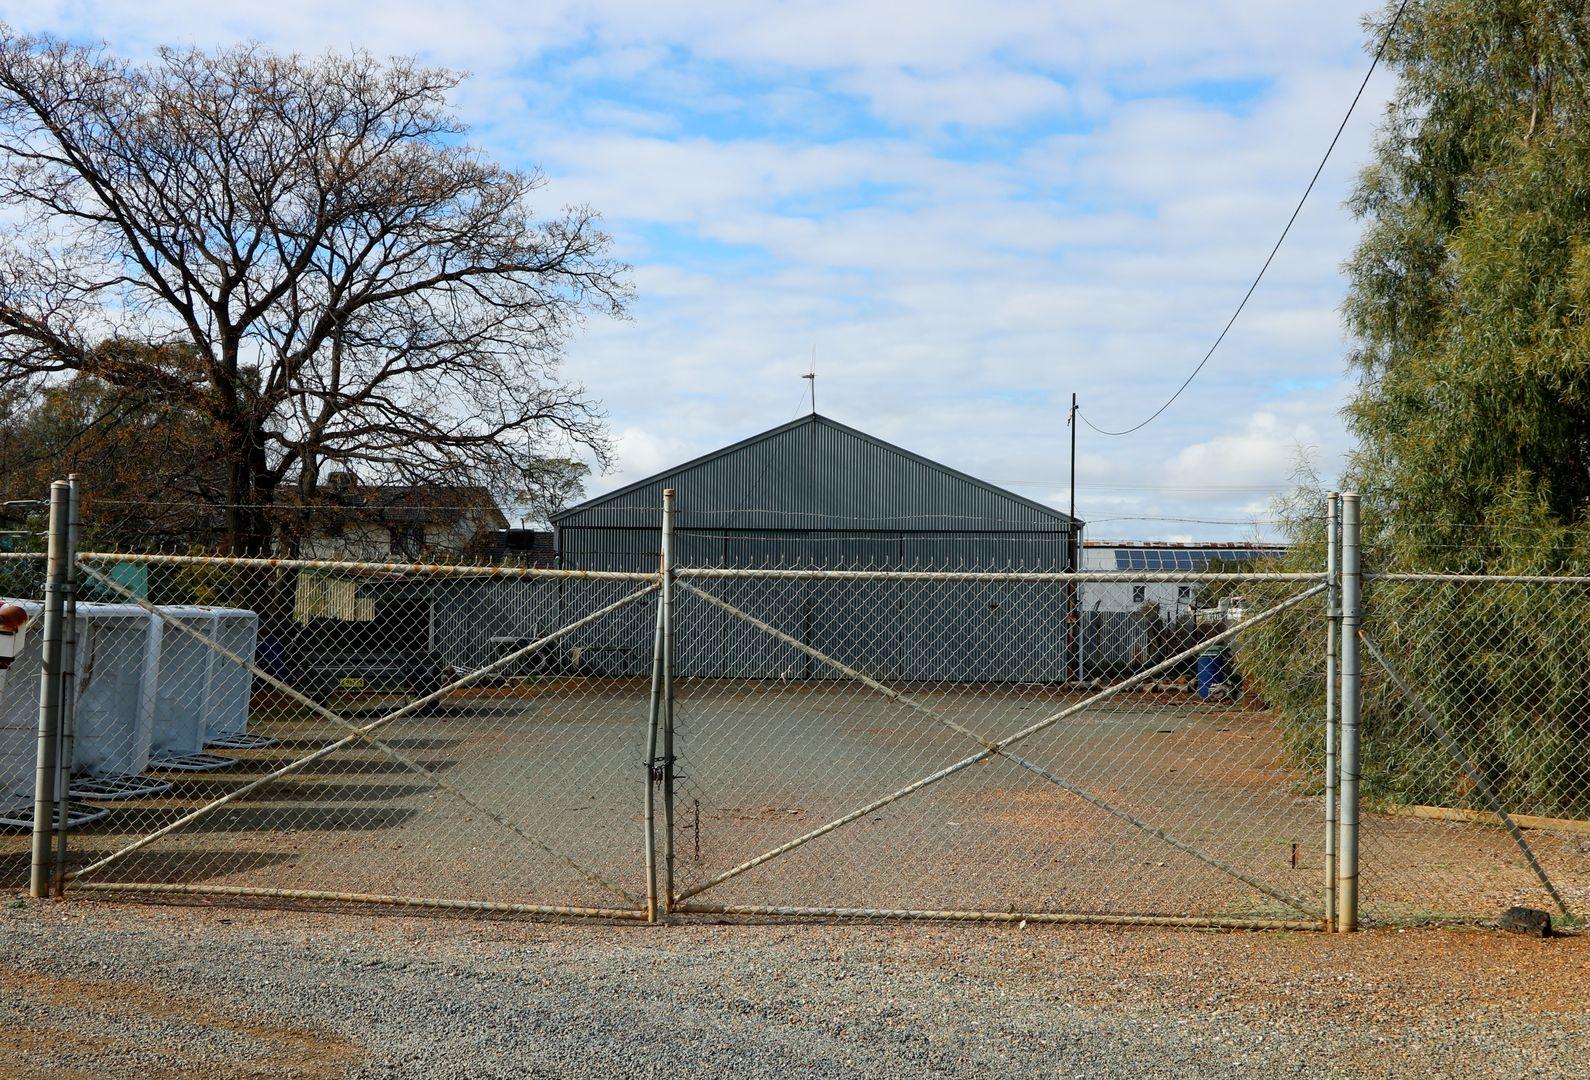 37 PEARCE STREET, Parkes NSW 2870, Image 0